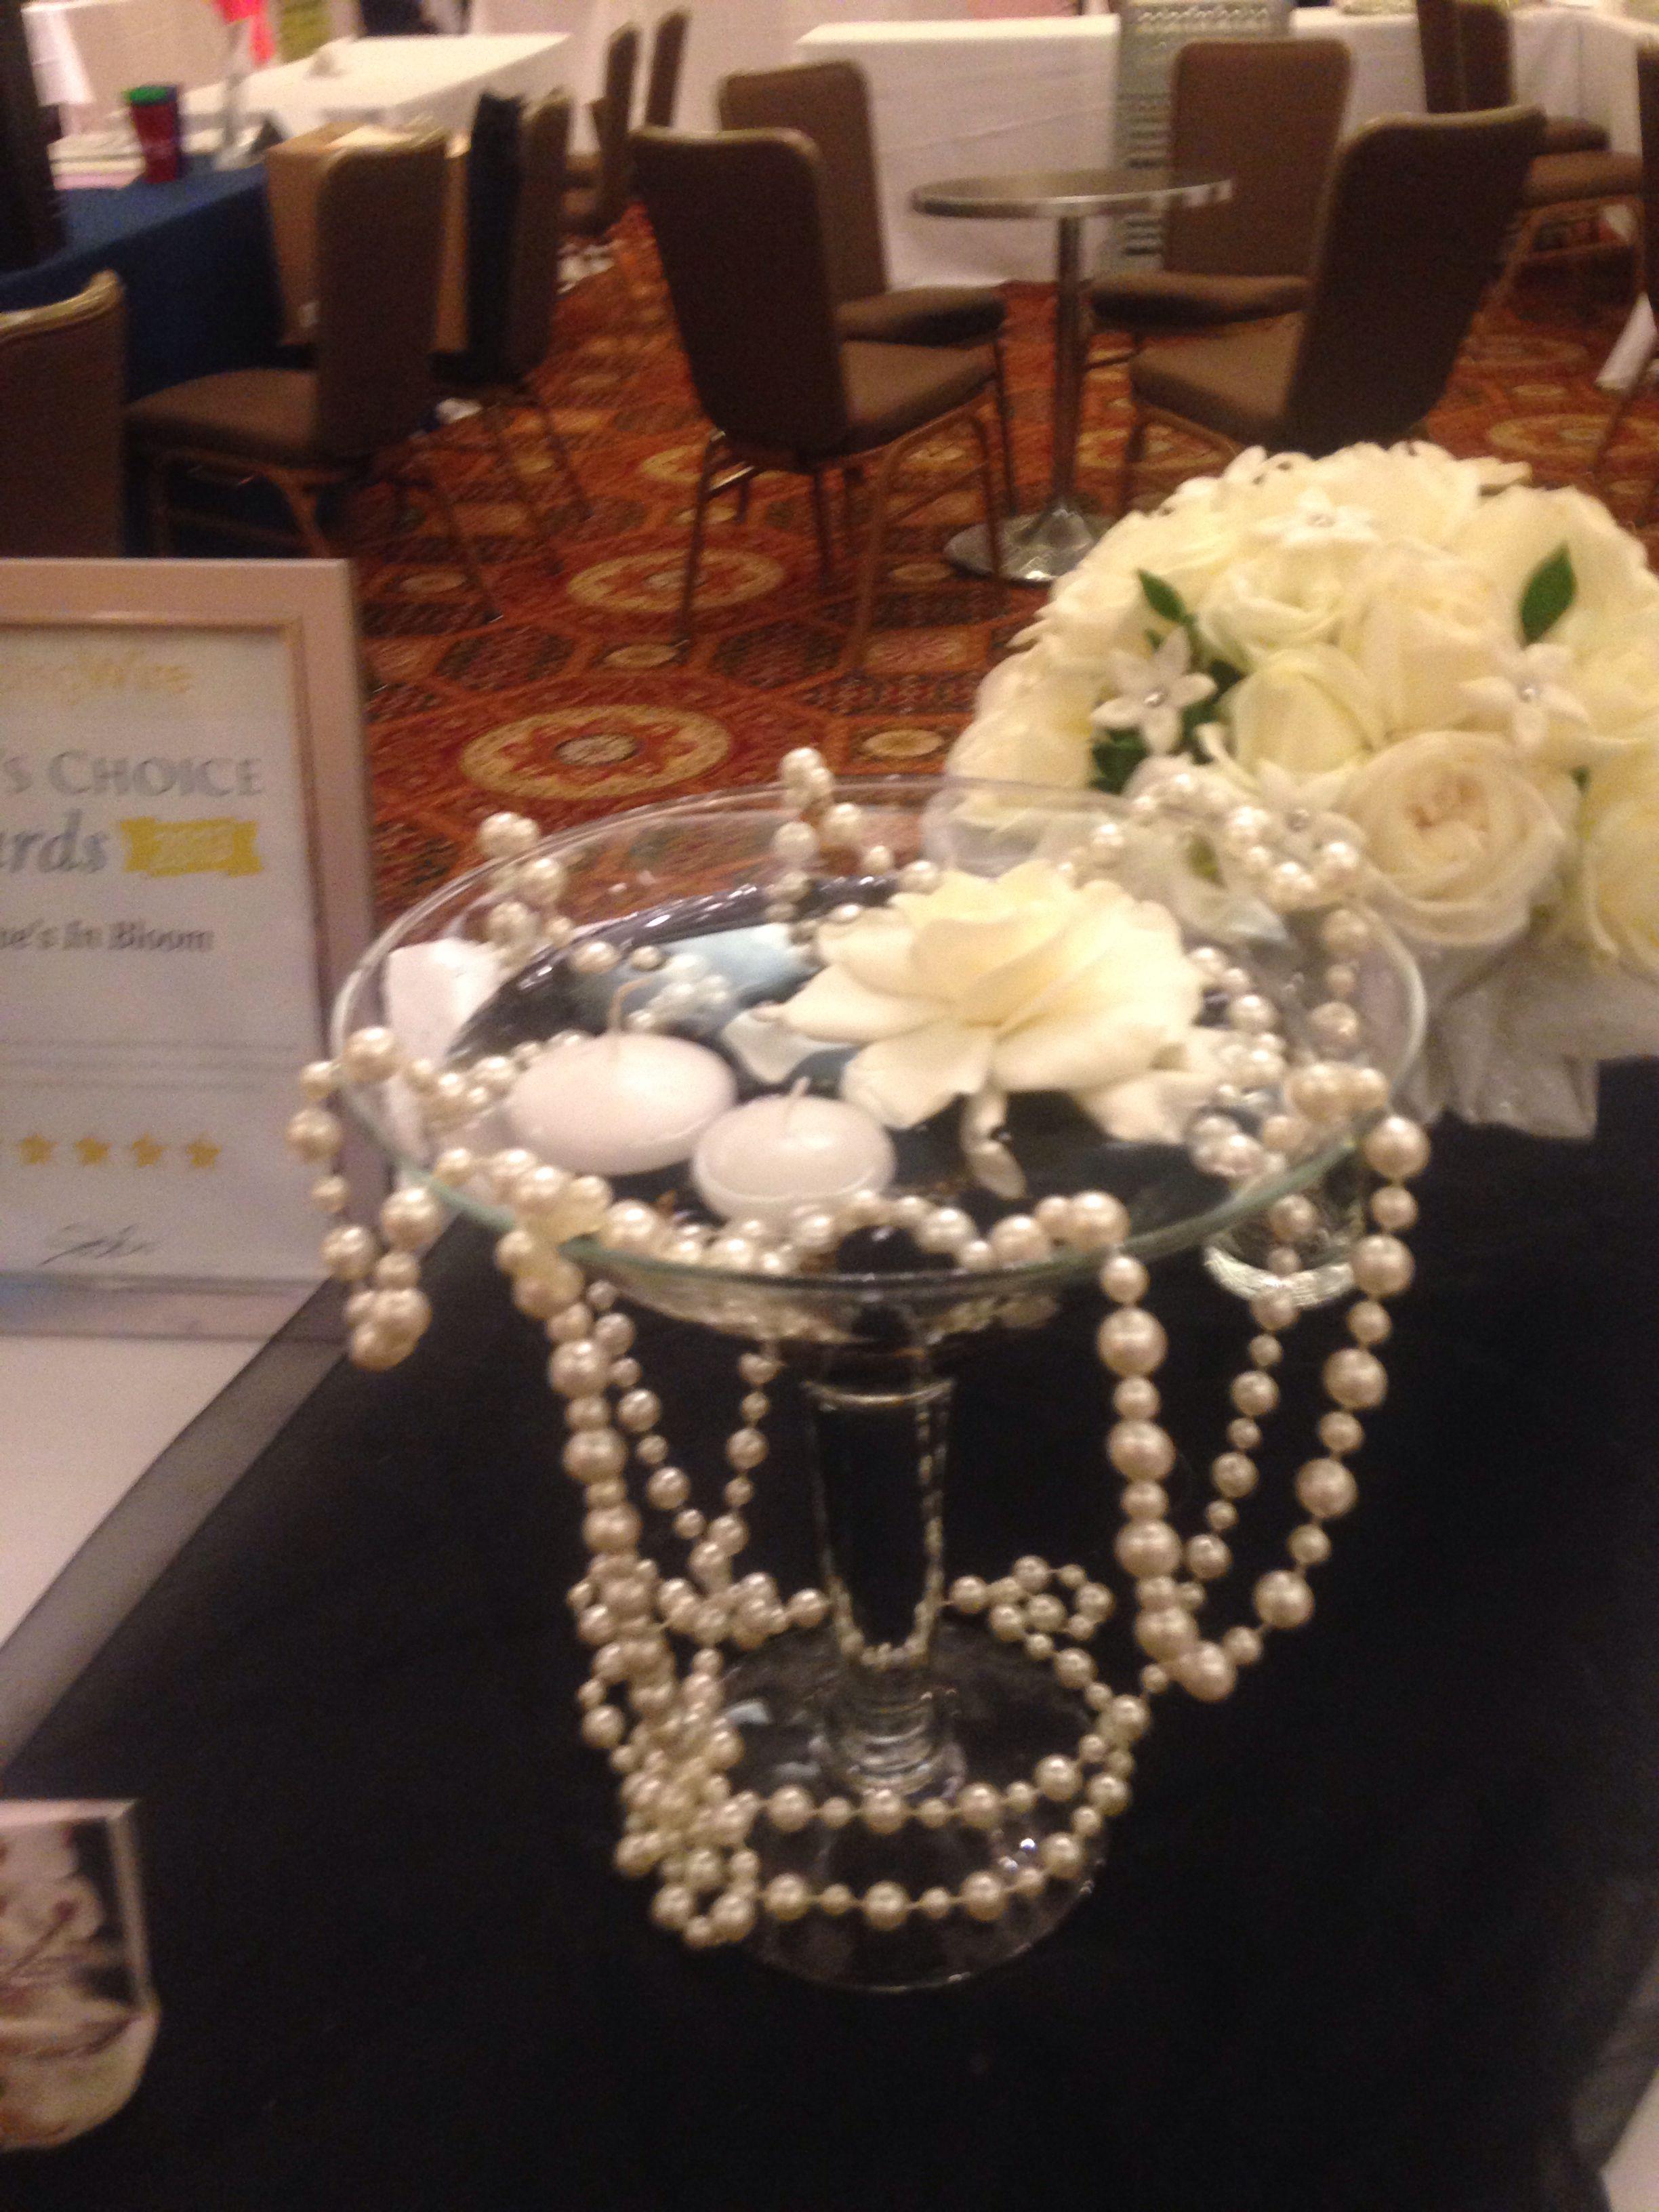 1920's wedding decorations ideas  Great Gatsby themed centerpiece  MKR dinner Steve and Andrea ideas